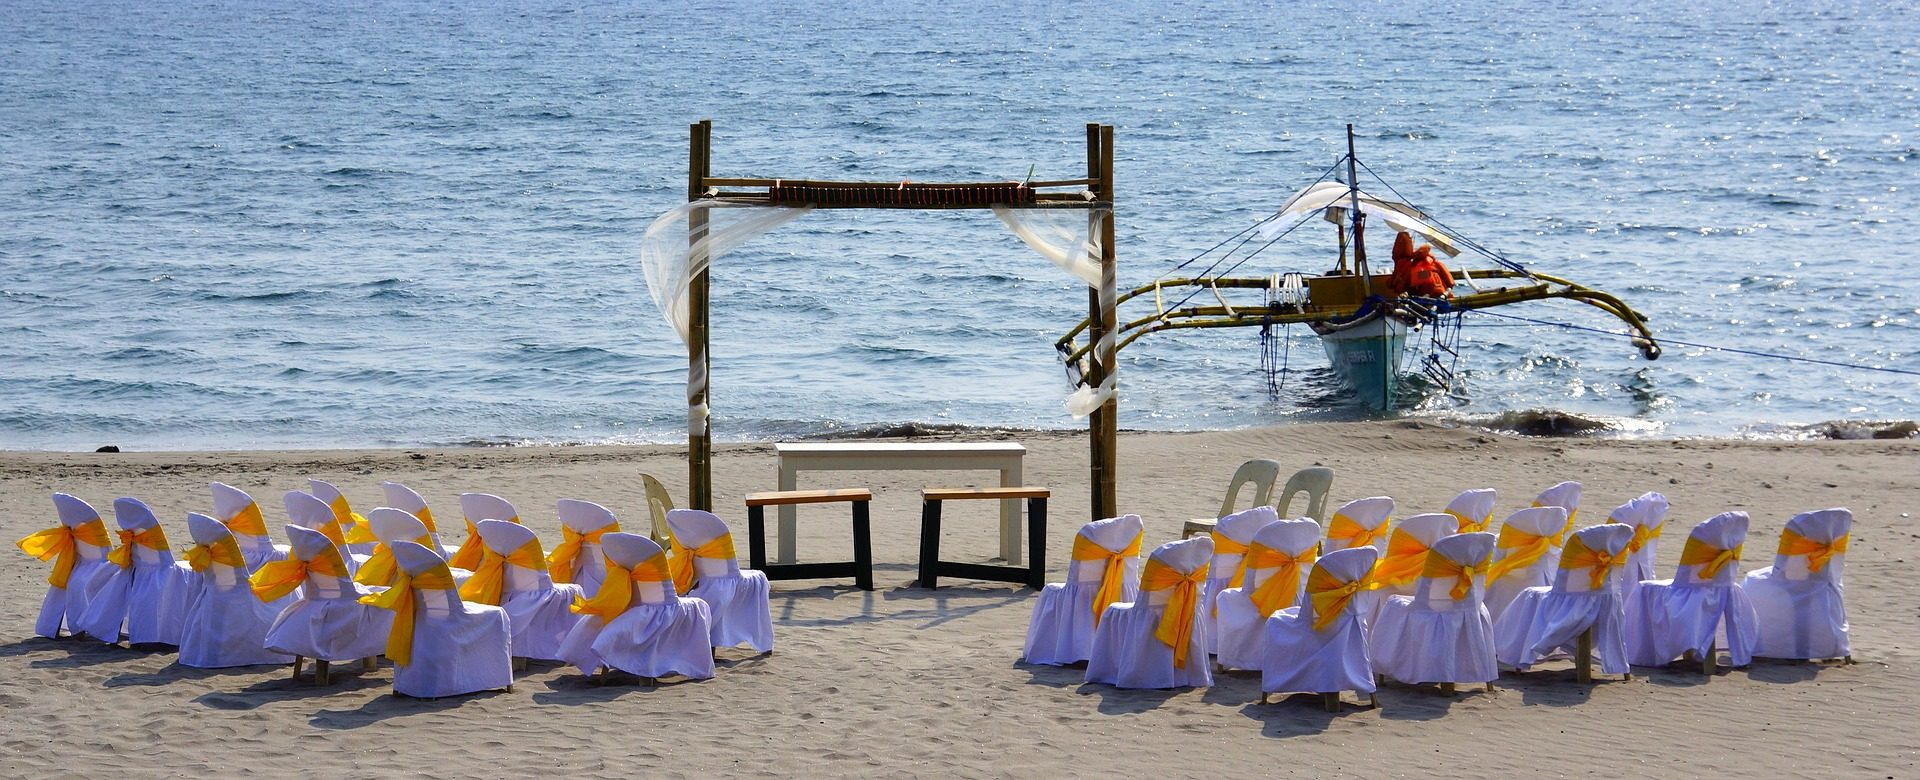 boda, mariage, célébration, Plage, sable, Mer - Fonds d'écran HD - Professor-falken.com